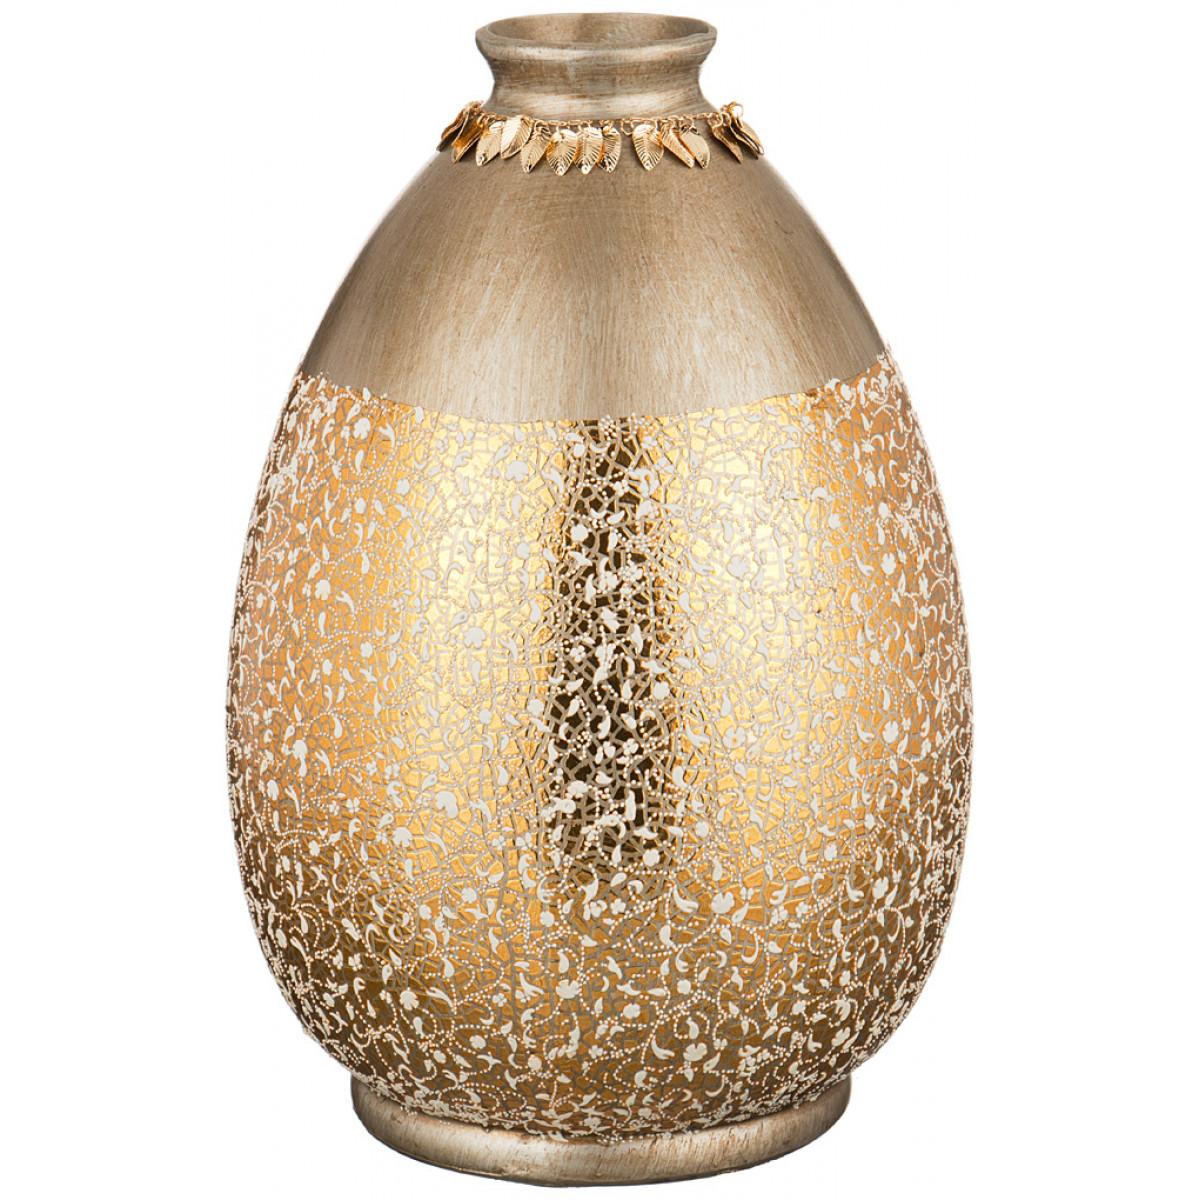 {} Lefard Ваза Karenza  (26х36 см) ваза кружева цветов 26 см